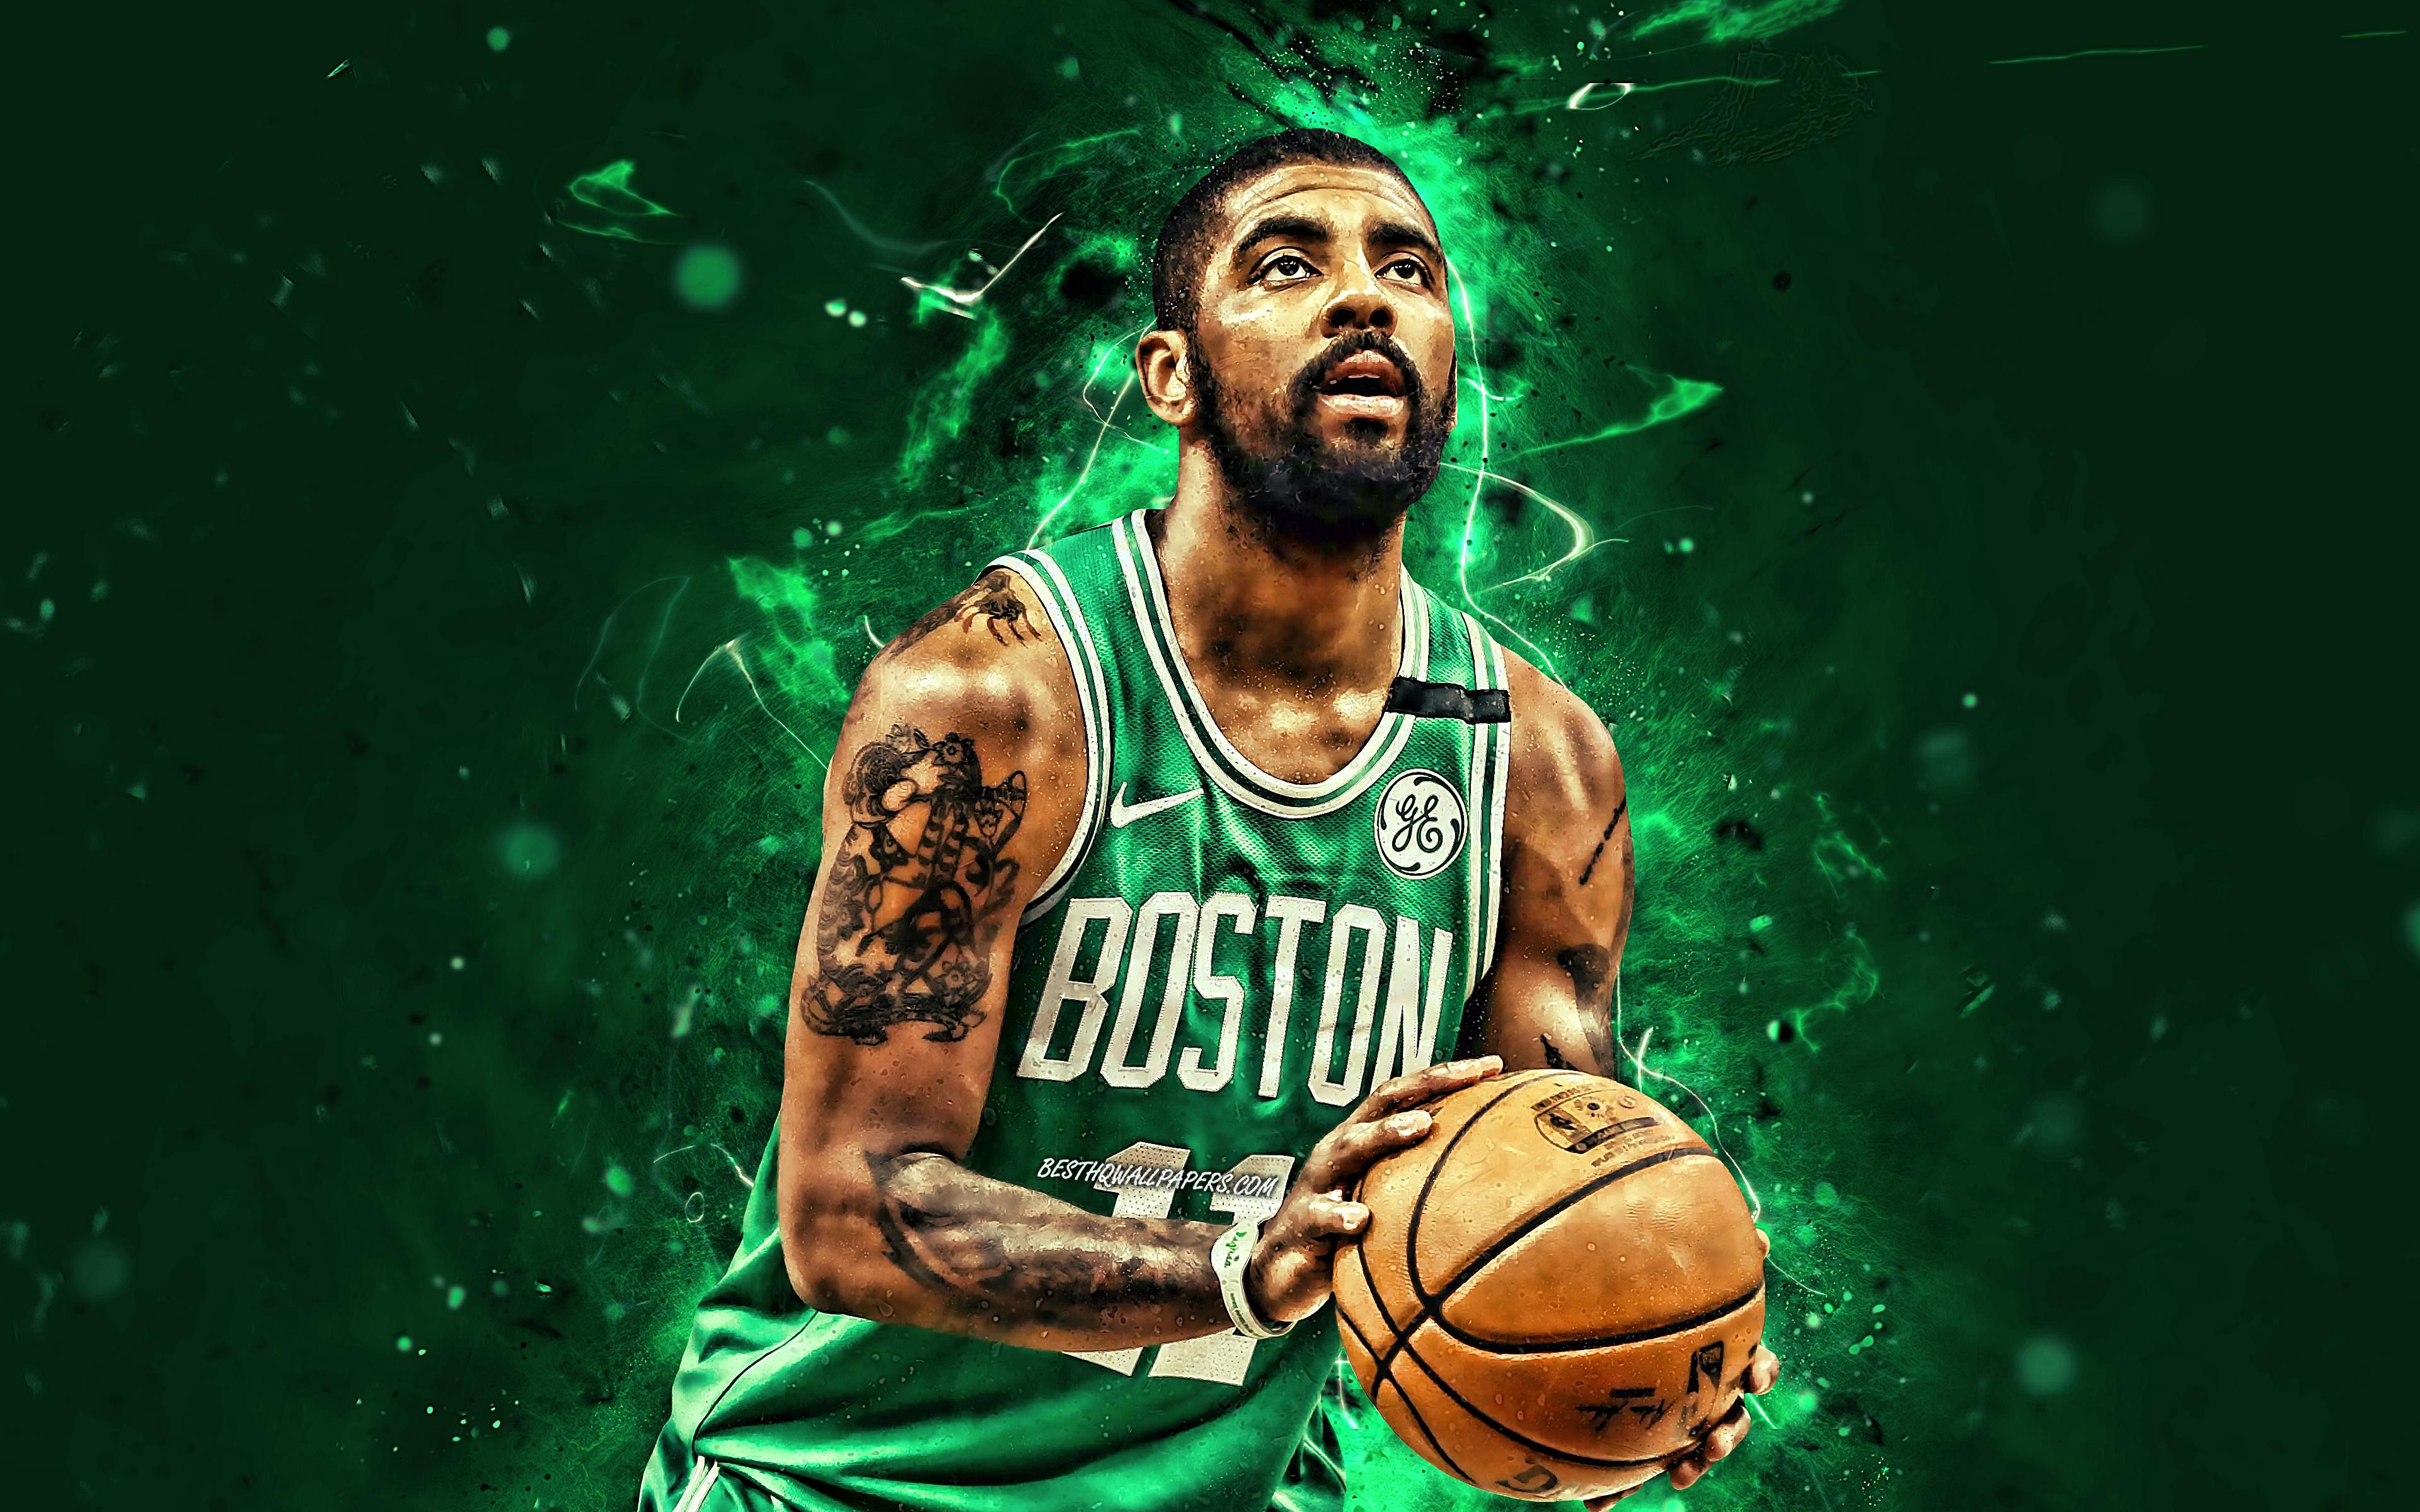 Kyrie Irving, 4k, Nba, Boston Celtics, Basketball Stars, - Kyrie Irving 4k Pc , HD Wallpaper & Backgrounds